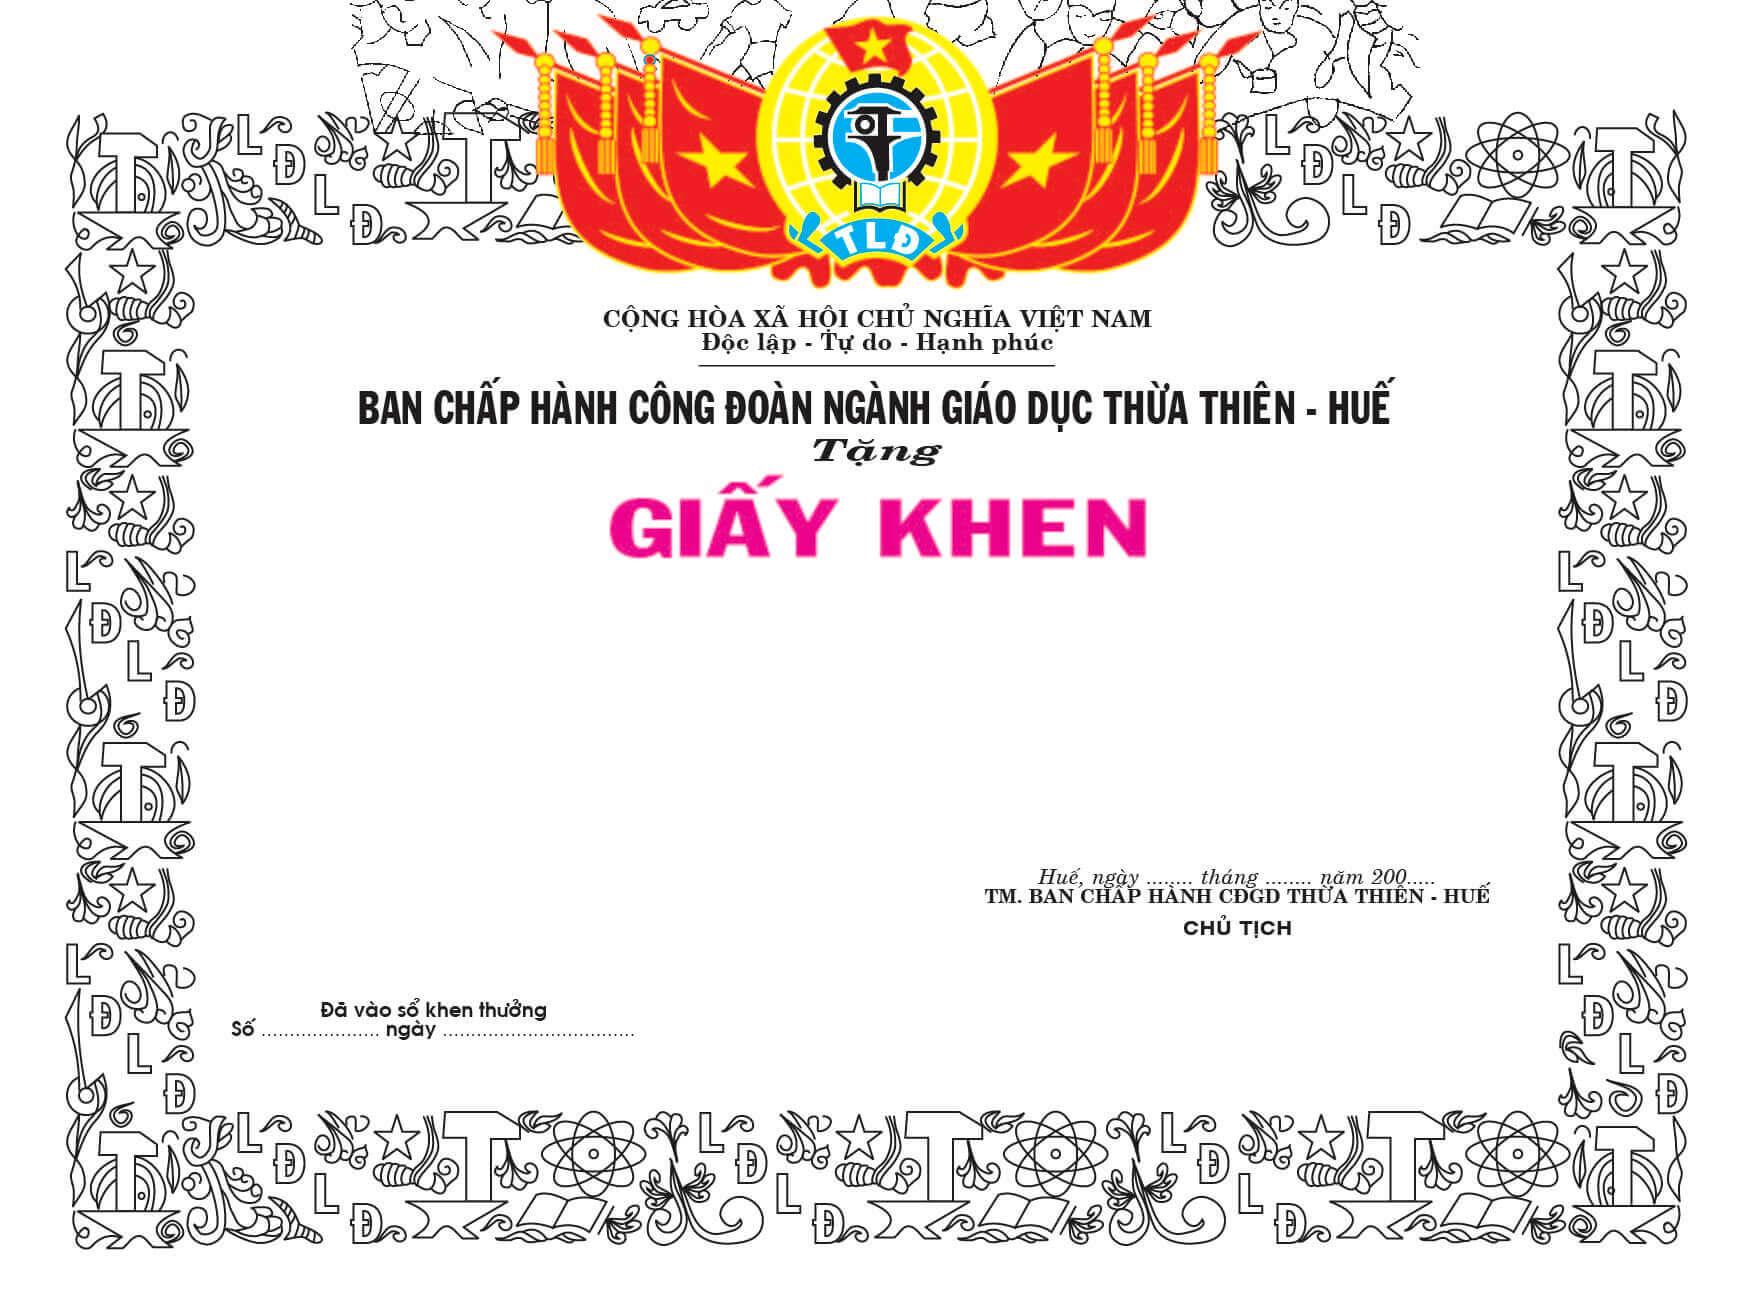 Mẫu giấy khen 009 - mẫu giấy khen Công Đoàn - Link Download : https://adsnew.net/J5BlX2F